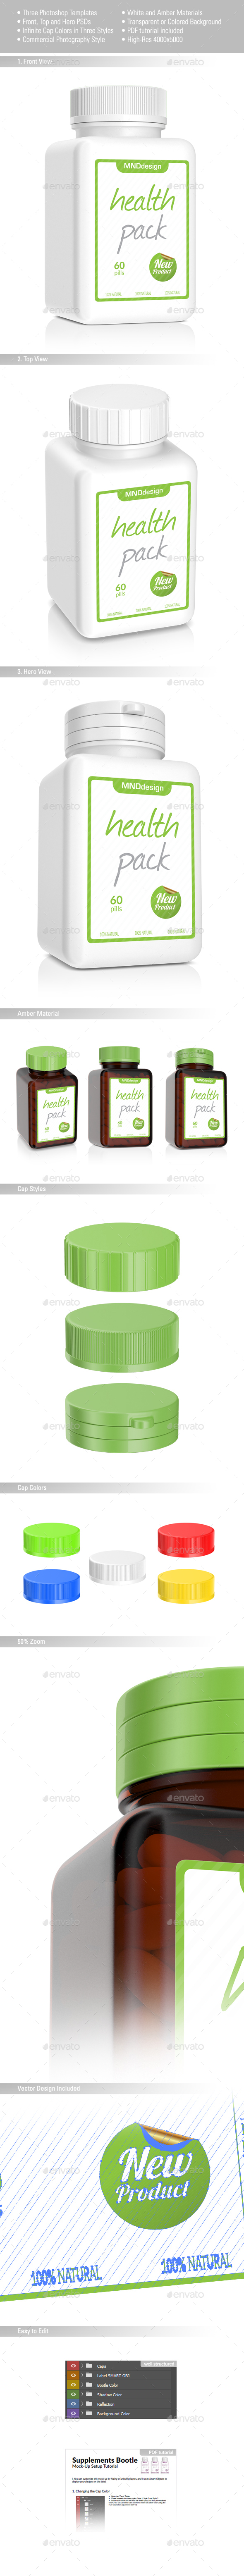 Pills Square Bottle Mockup